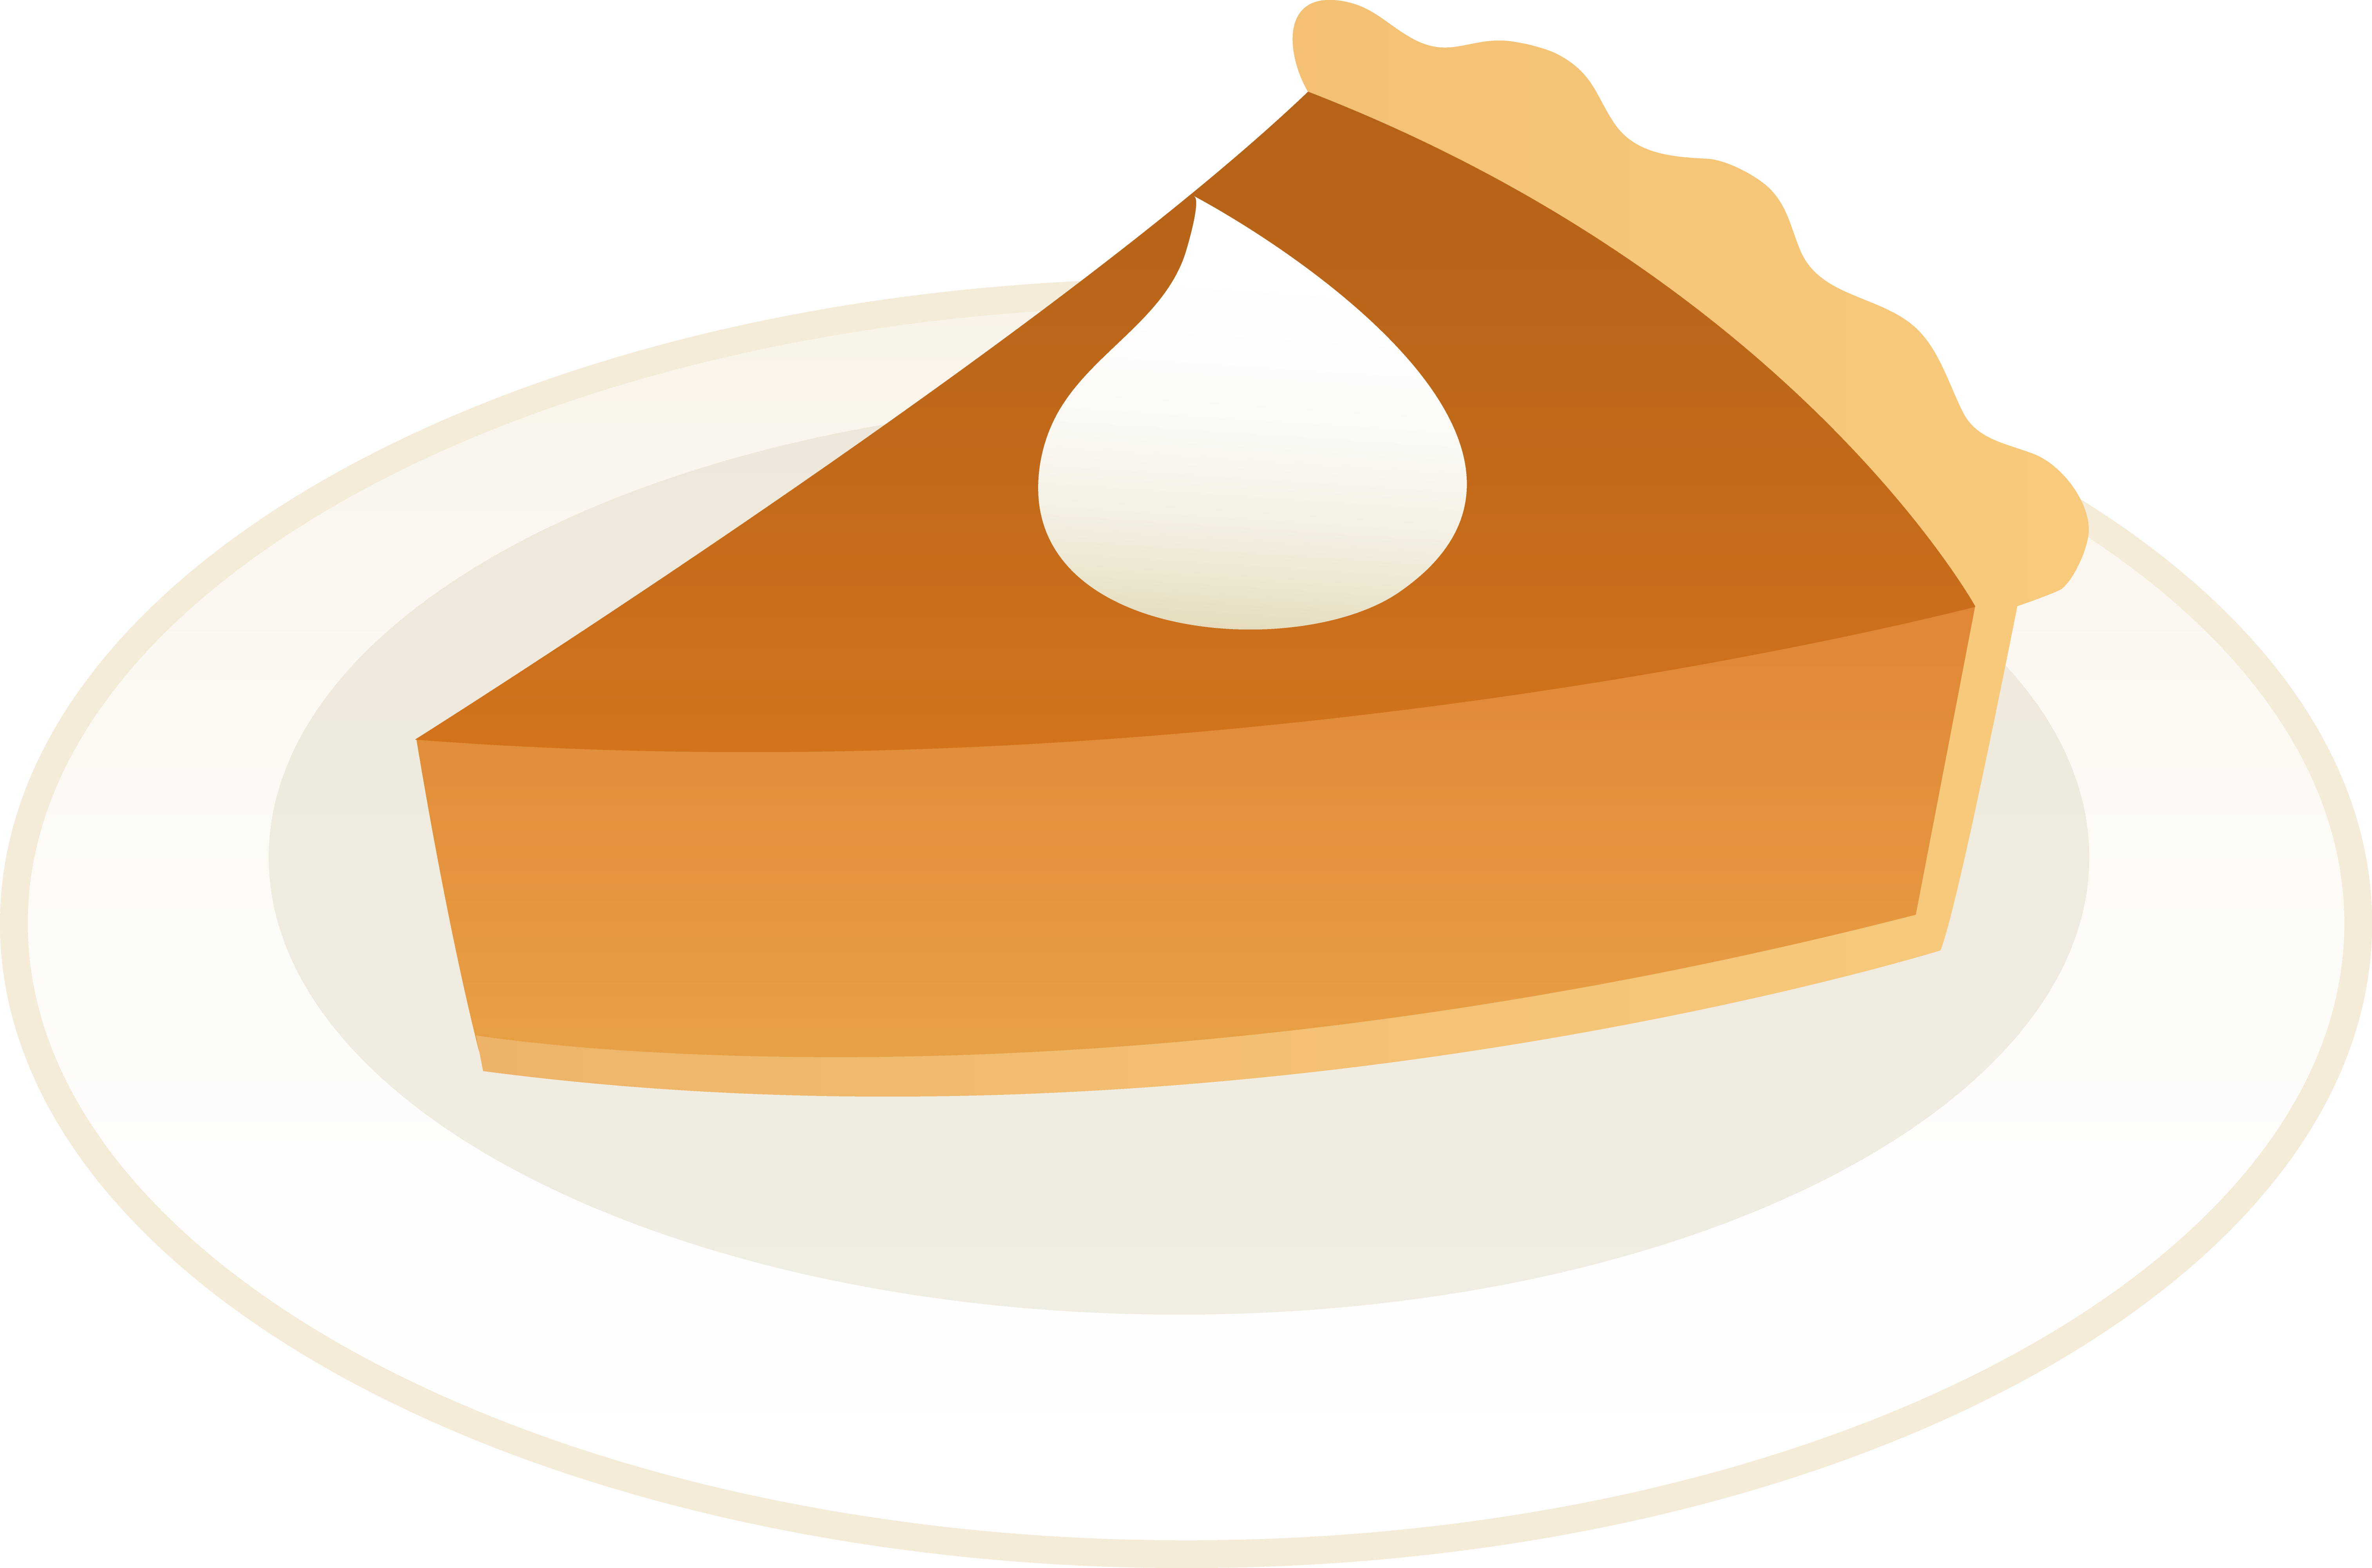 6055x4003 Slice Of Pumpkin Pie On Plate